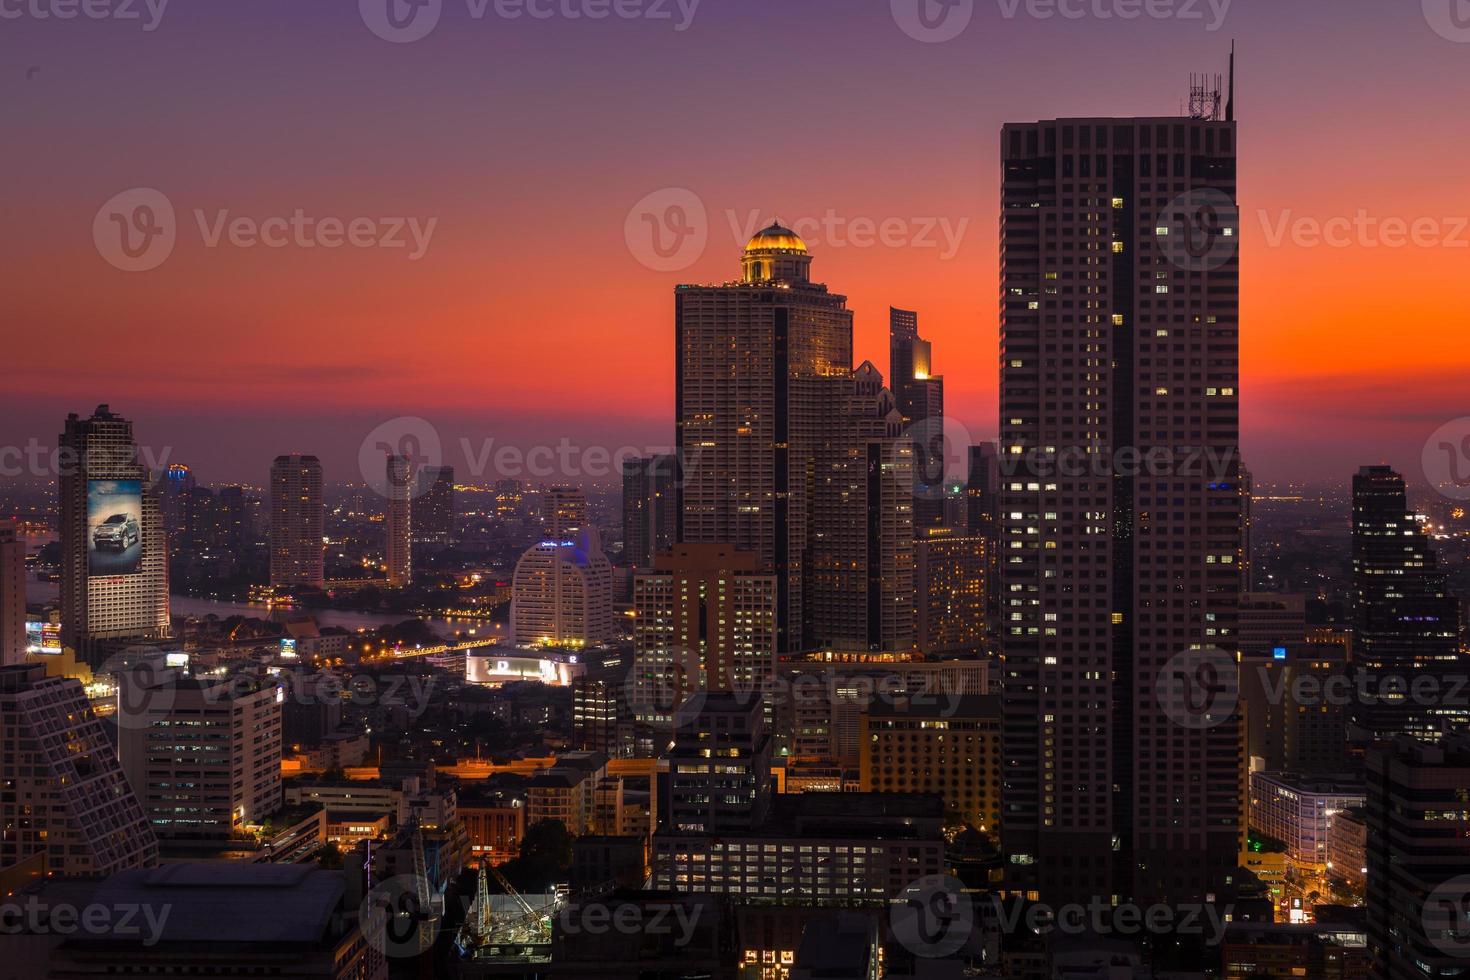 bangkok stad landschap met zonsondergang foto